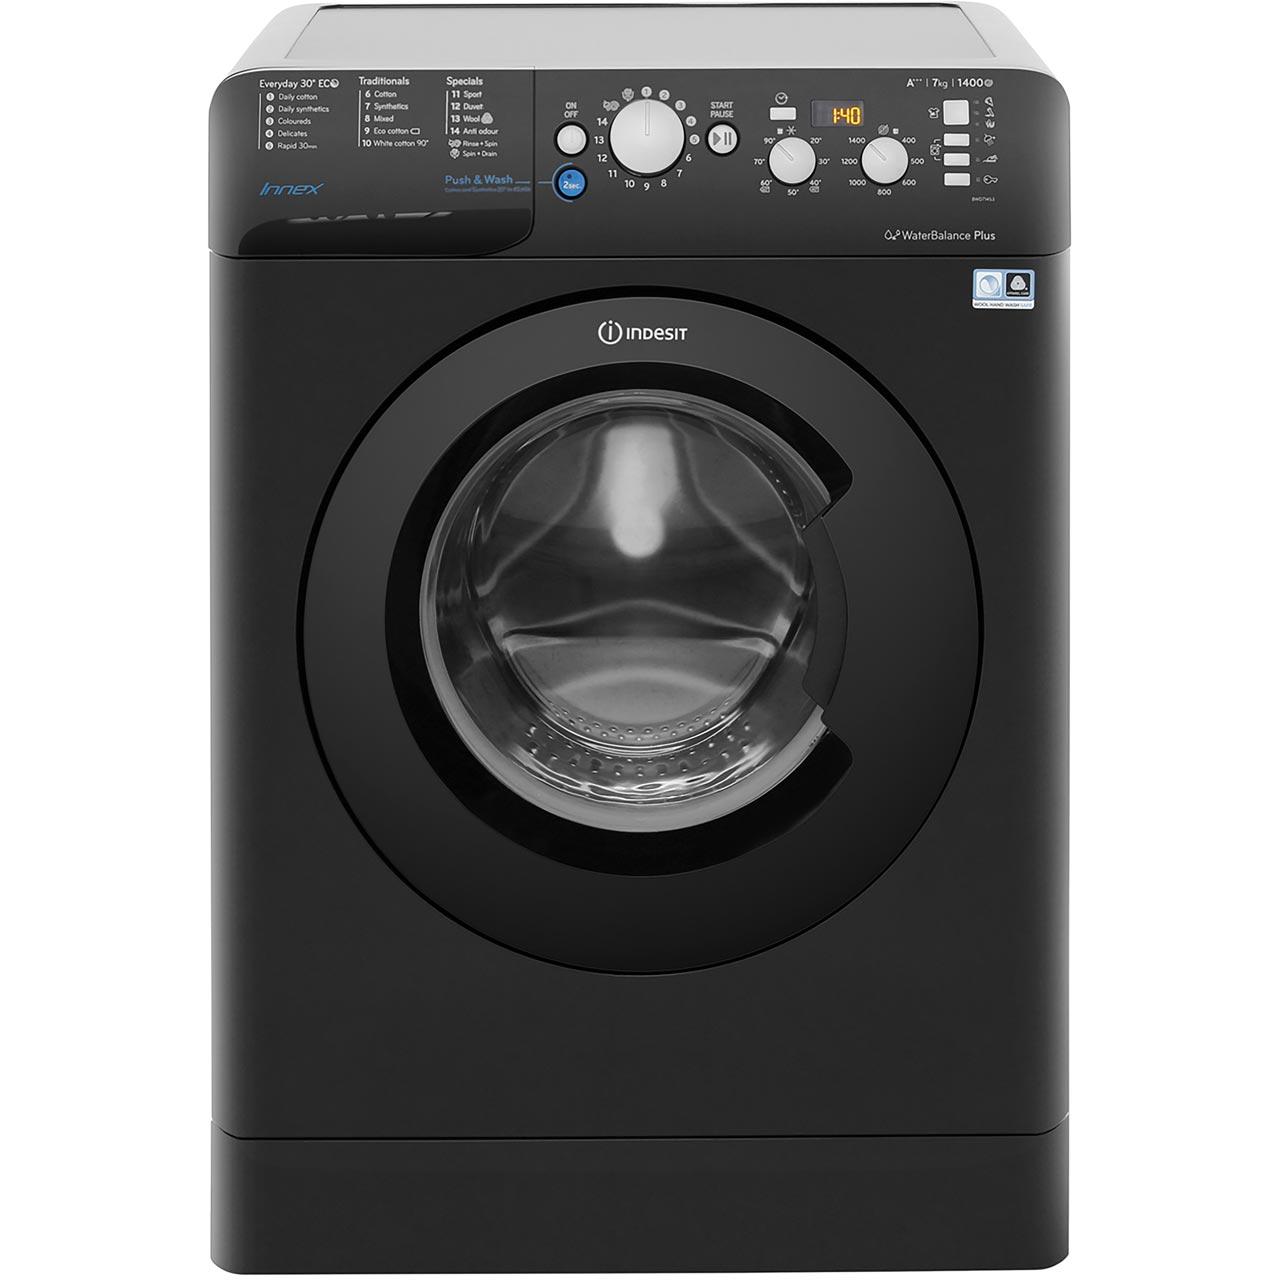 indesit innex bwd71453kuk washing machine black. Black Bedroom Furniture Sets. Home Design Ideas